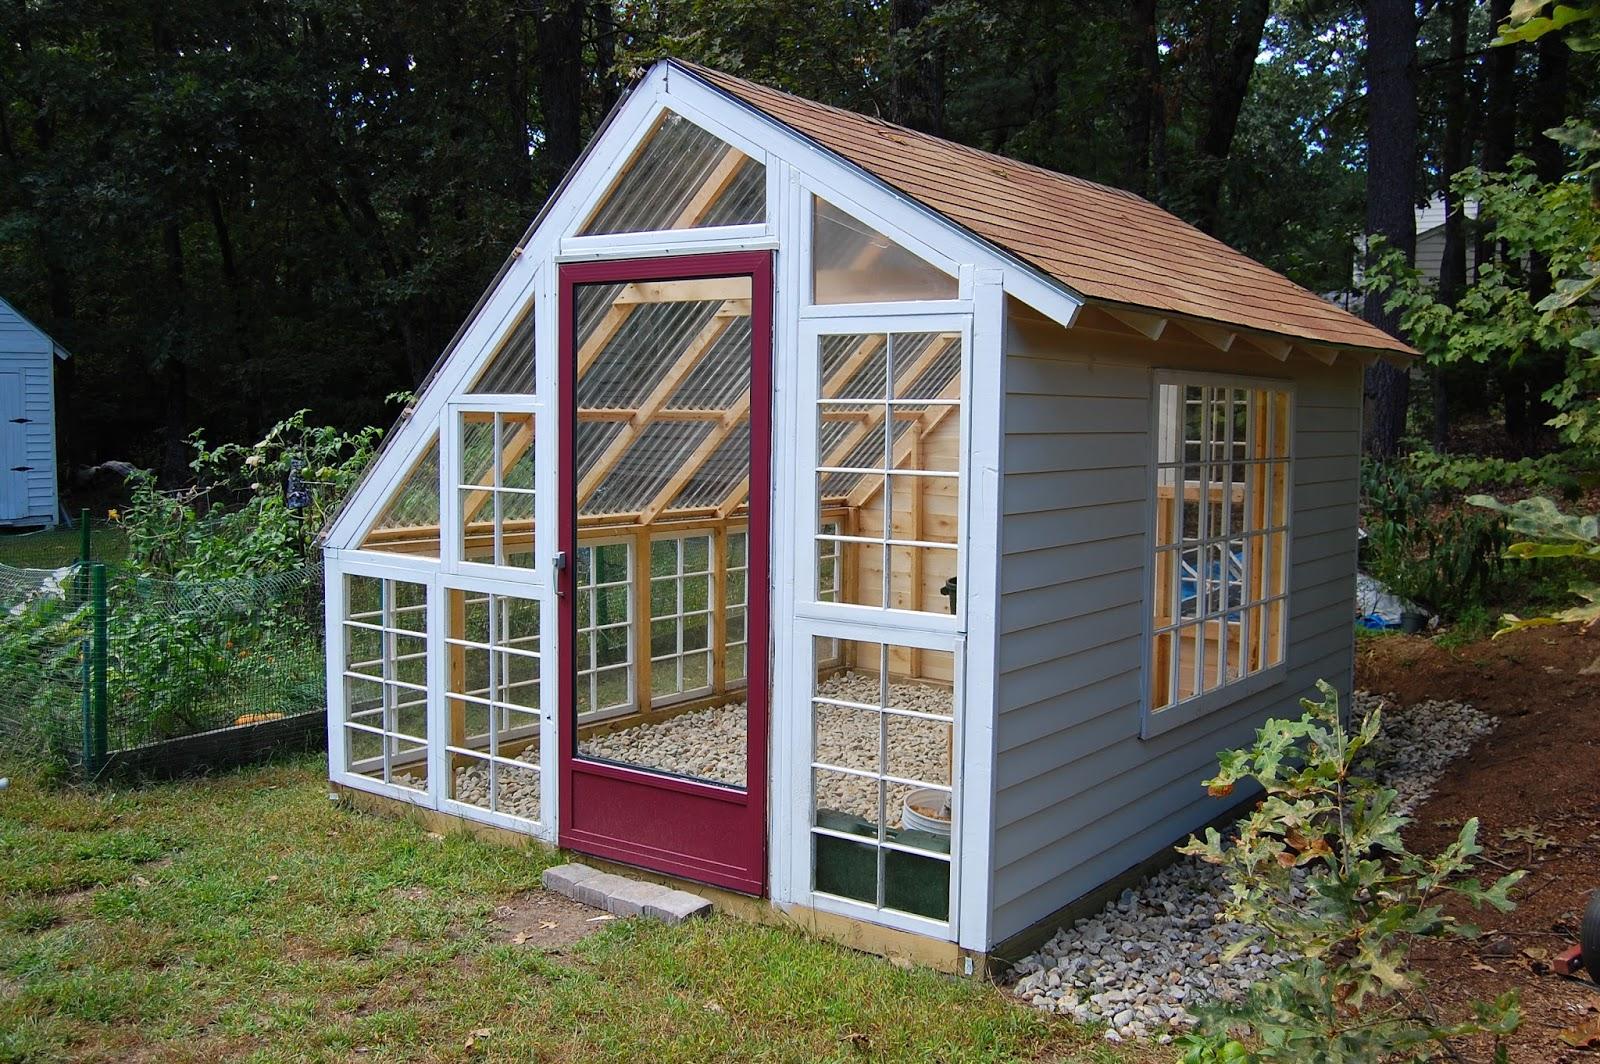 Custom Backyard Greenhouse With Recycled Windows December